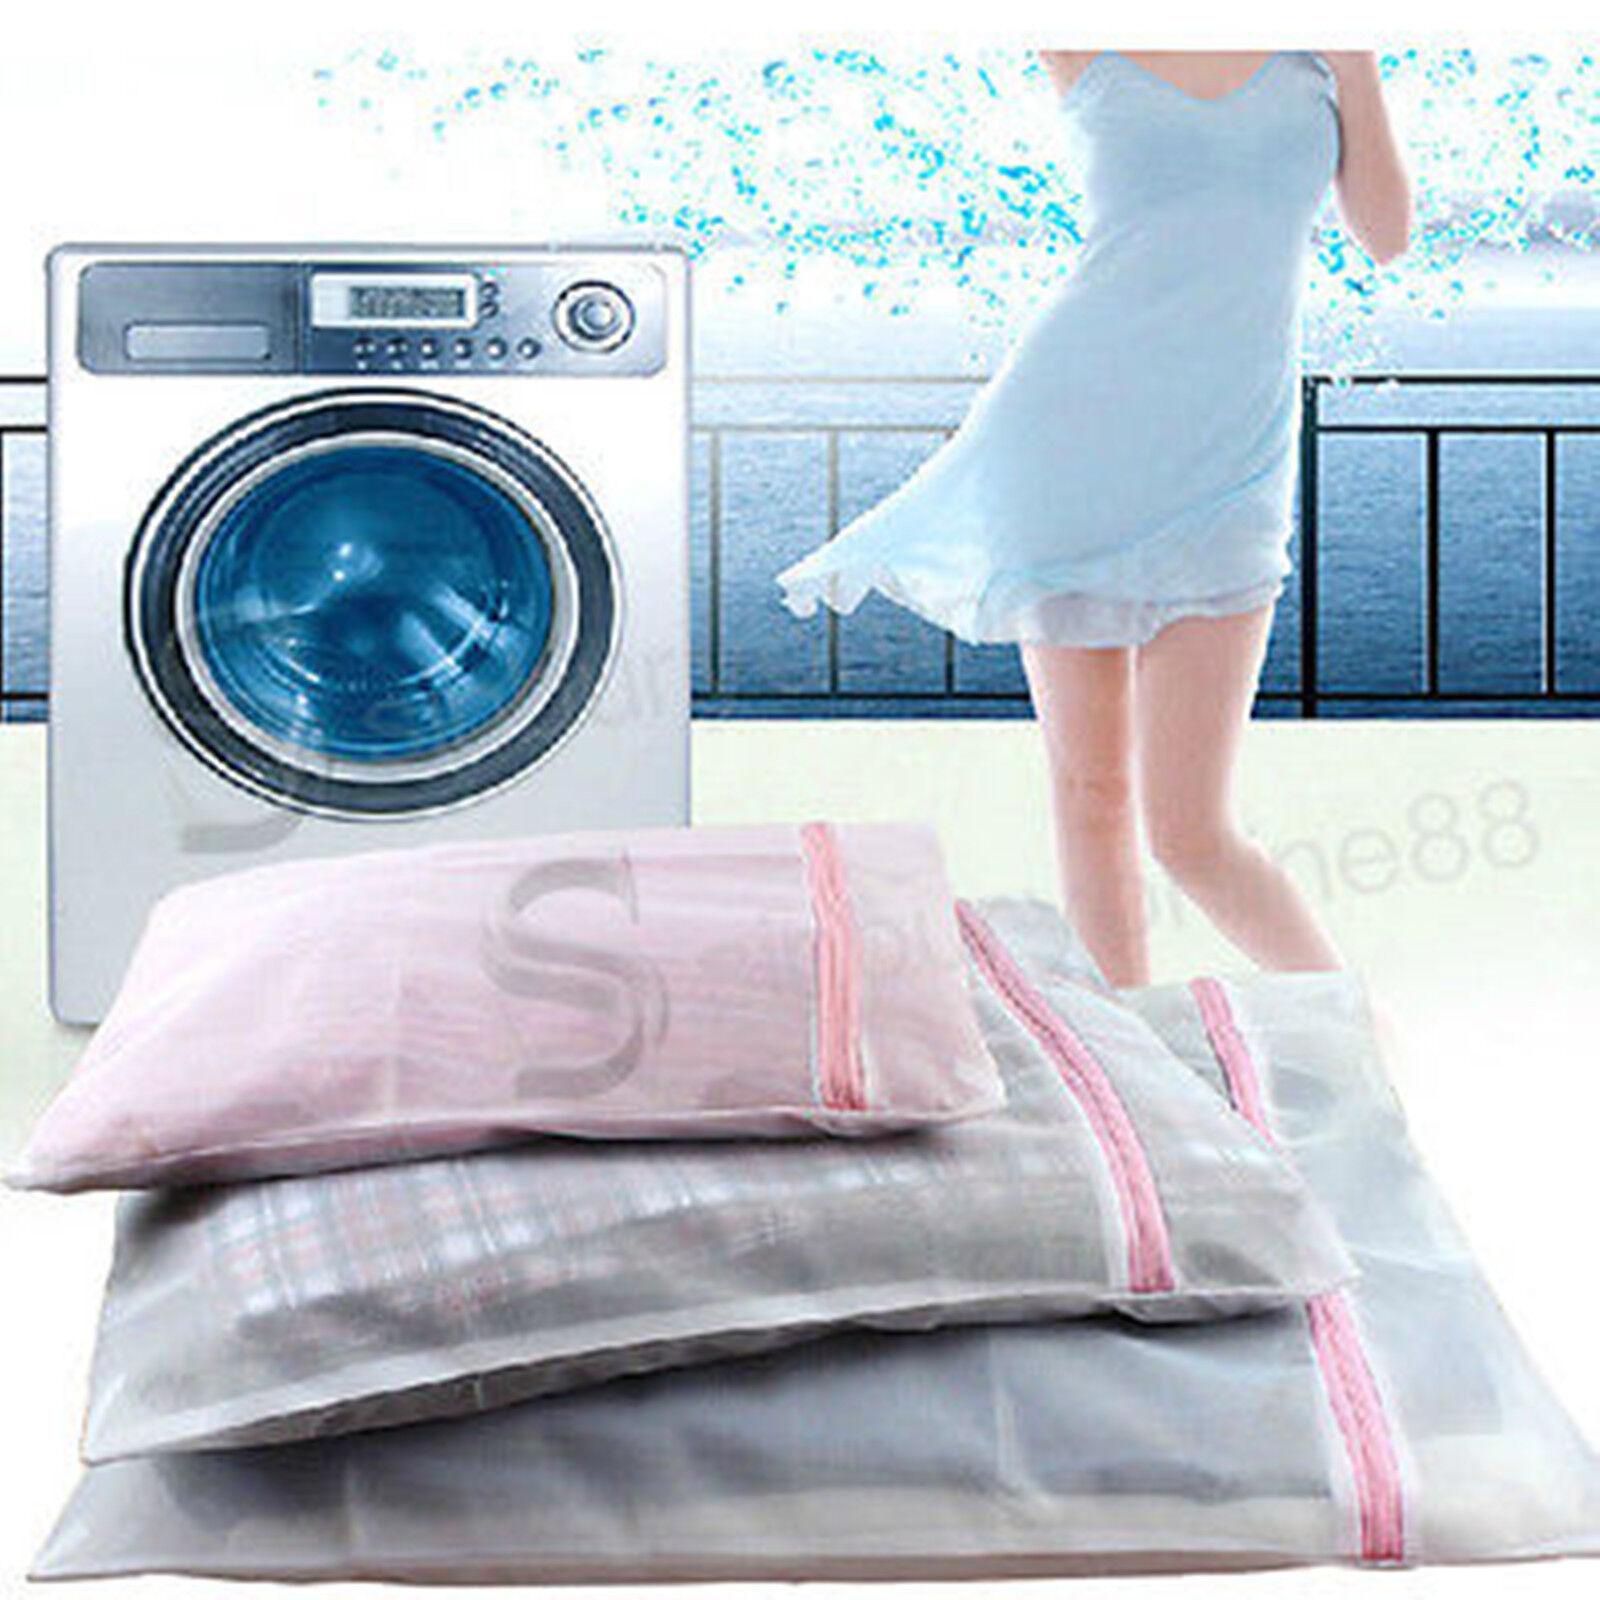 Washing The Washer In Backpack ~ Uk zipped laundry washing net mesh bra socks underwear